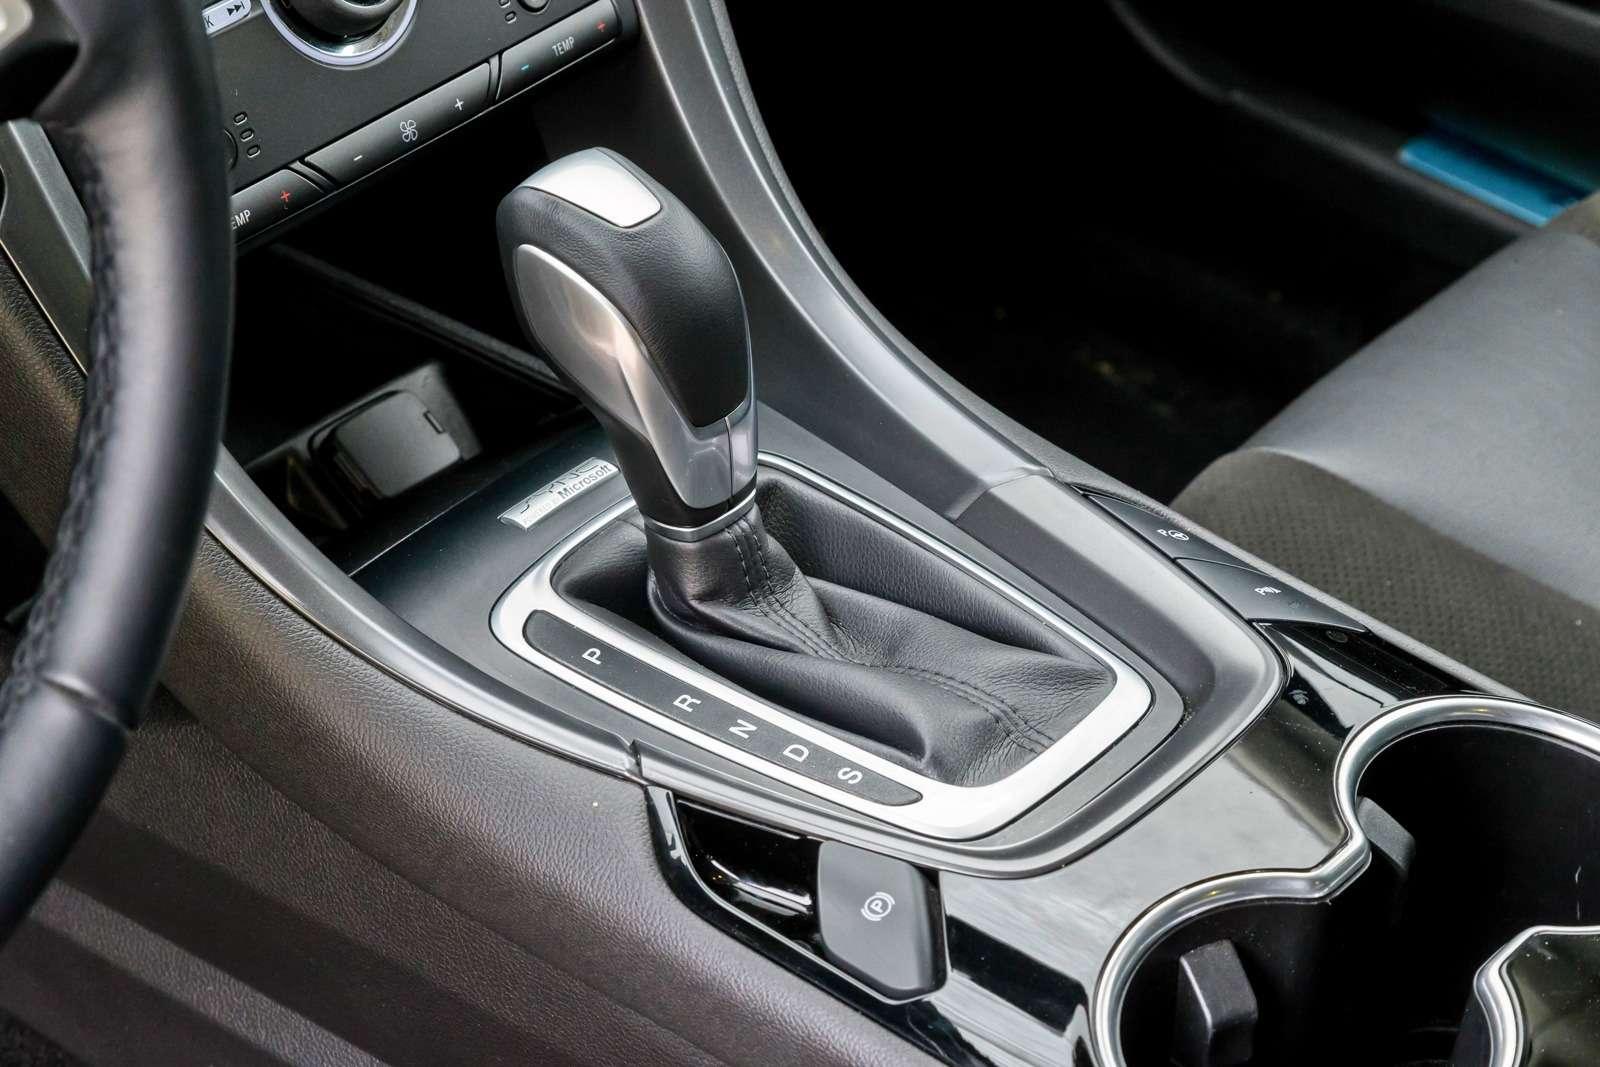 203-Passat_Mondeo_Mazda-6-zr09-15